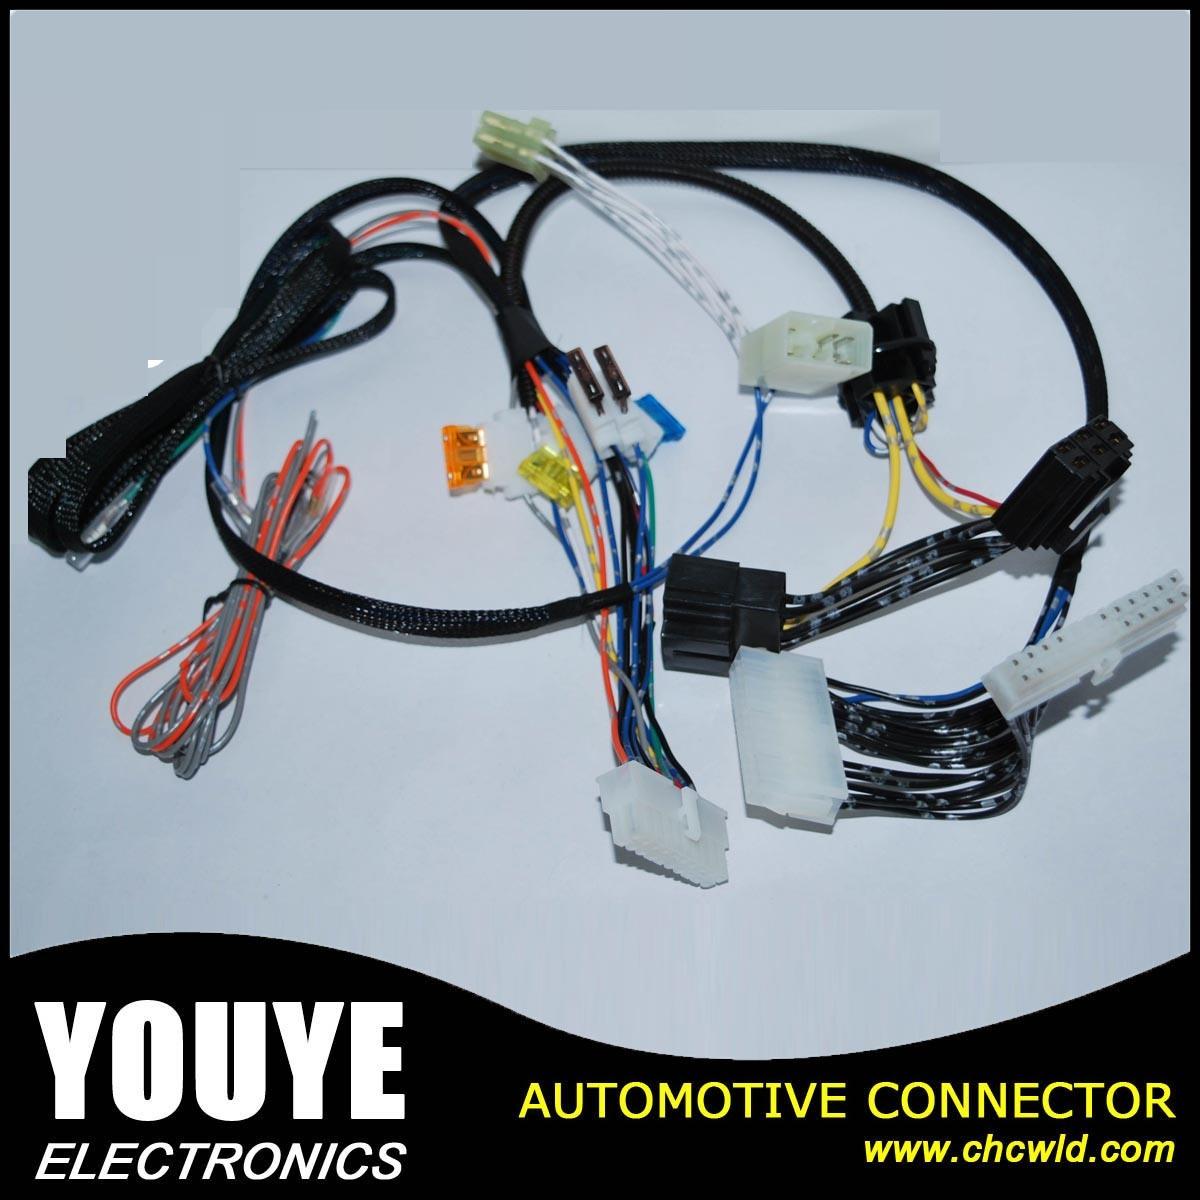 hight resolution of china truck suv atv car vehicle engine harness professional automotive harness wire cable china wire harness automotive wire harness